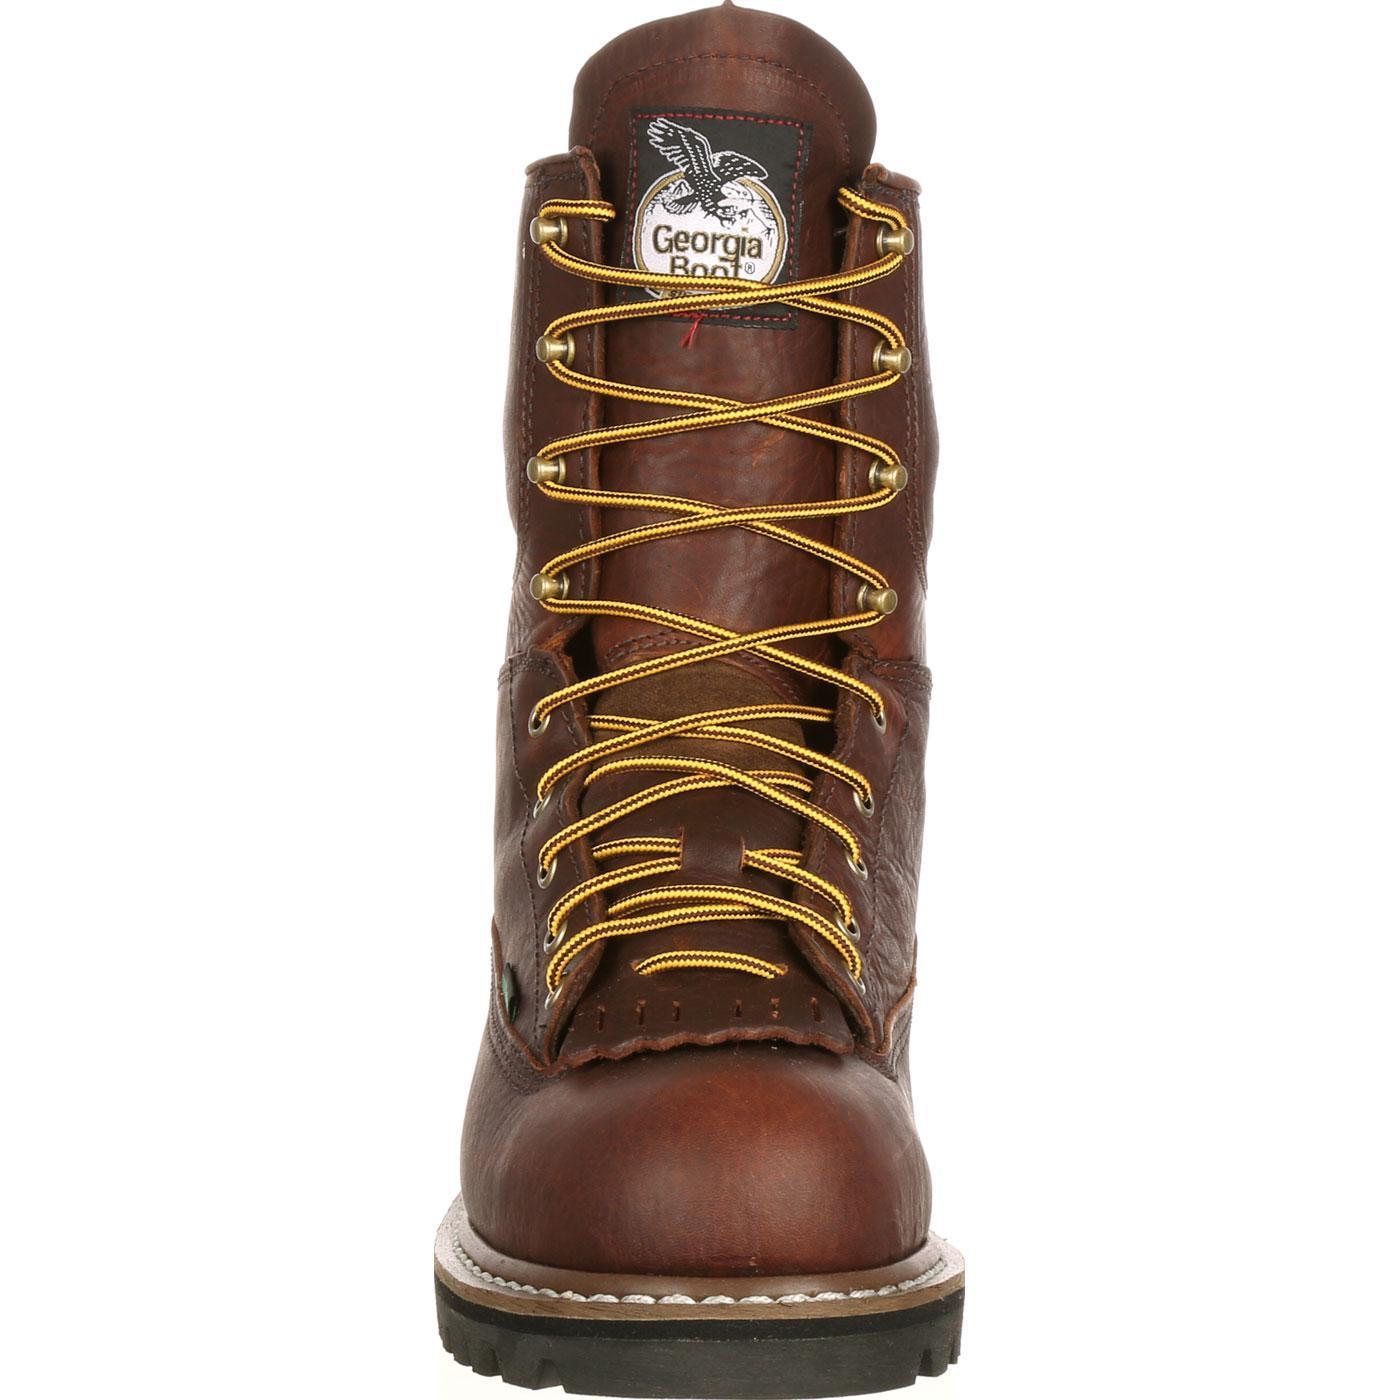 Georgia Boot Steel Toe Waterproof Lace To Toe Work Boot